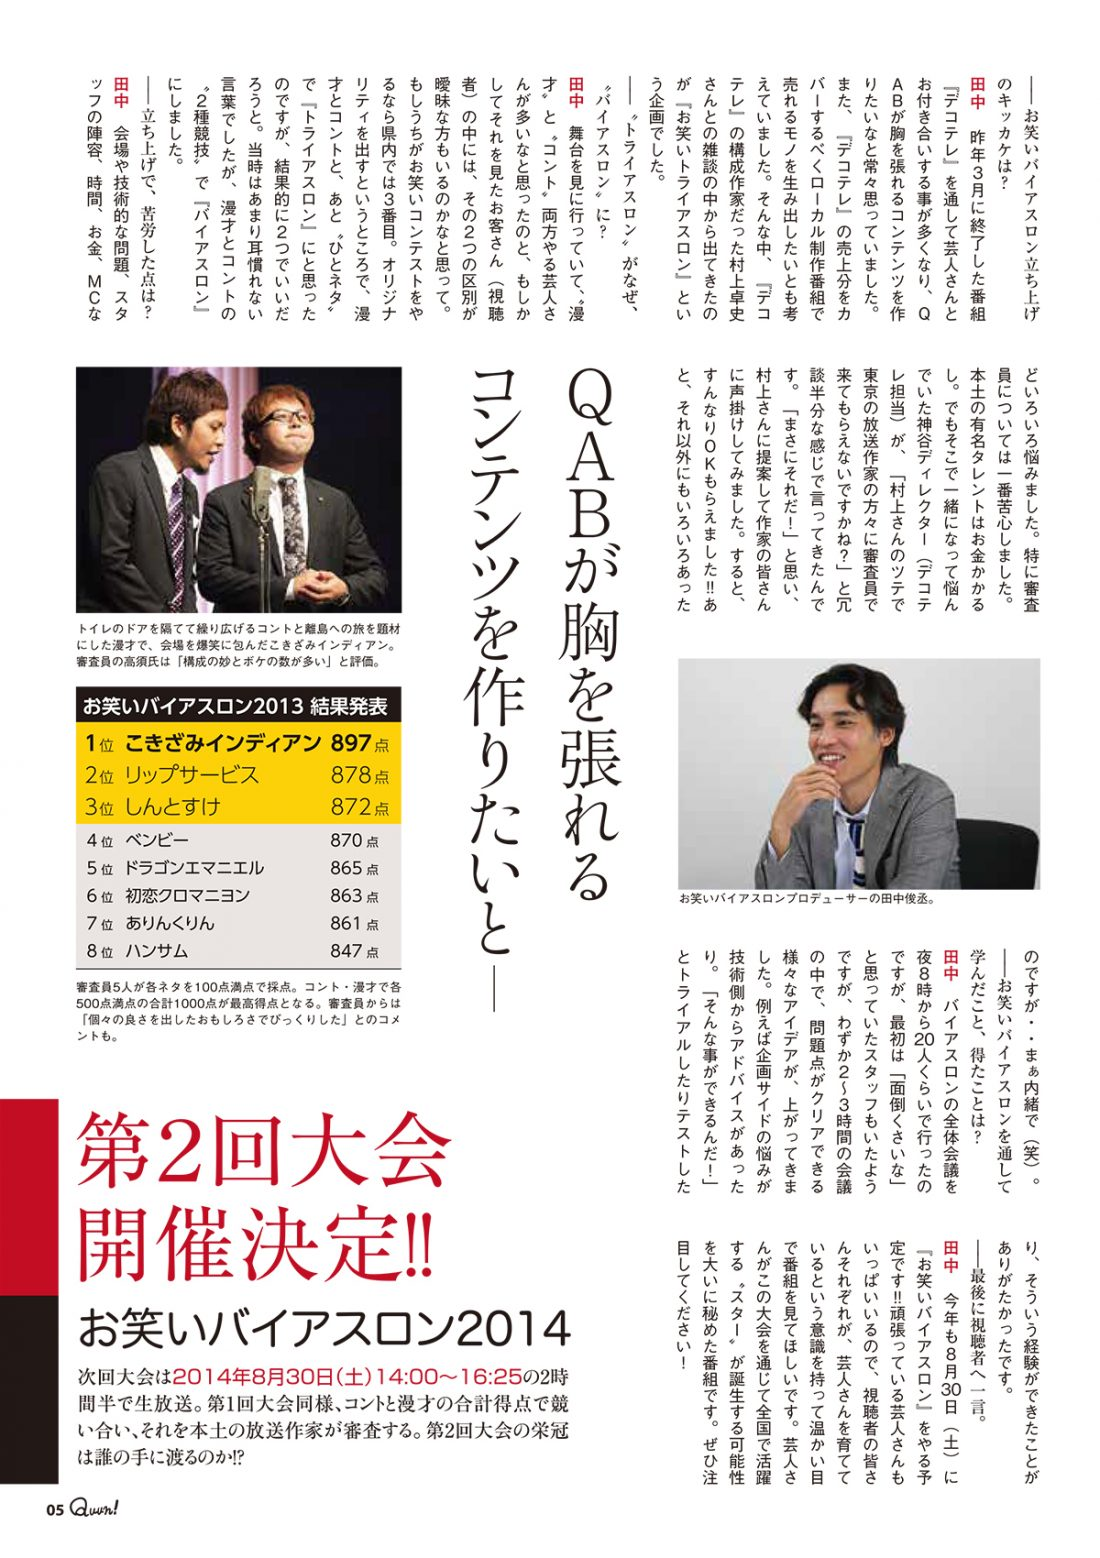 http://www.qab.co.jp/qgoro/wp-content/uploads/quun_0107-1100x1558.jpg